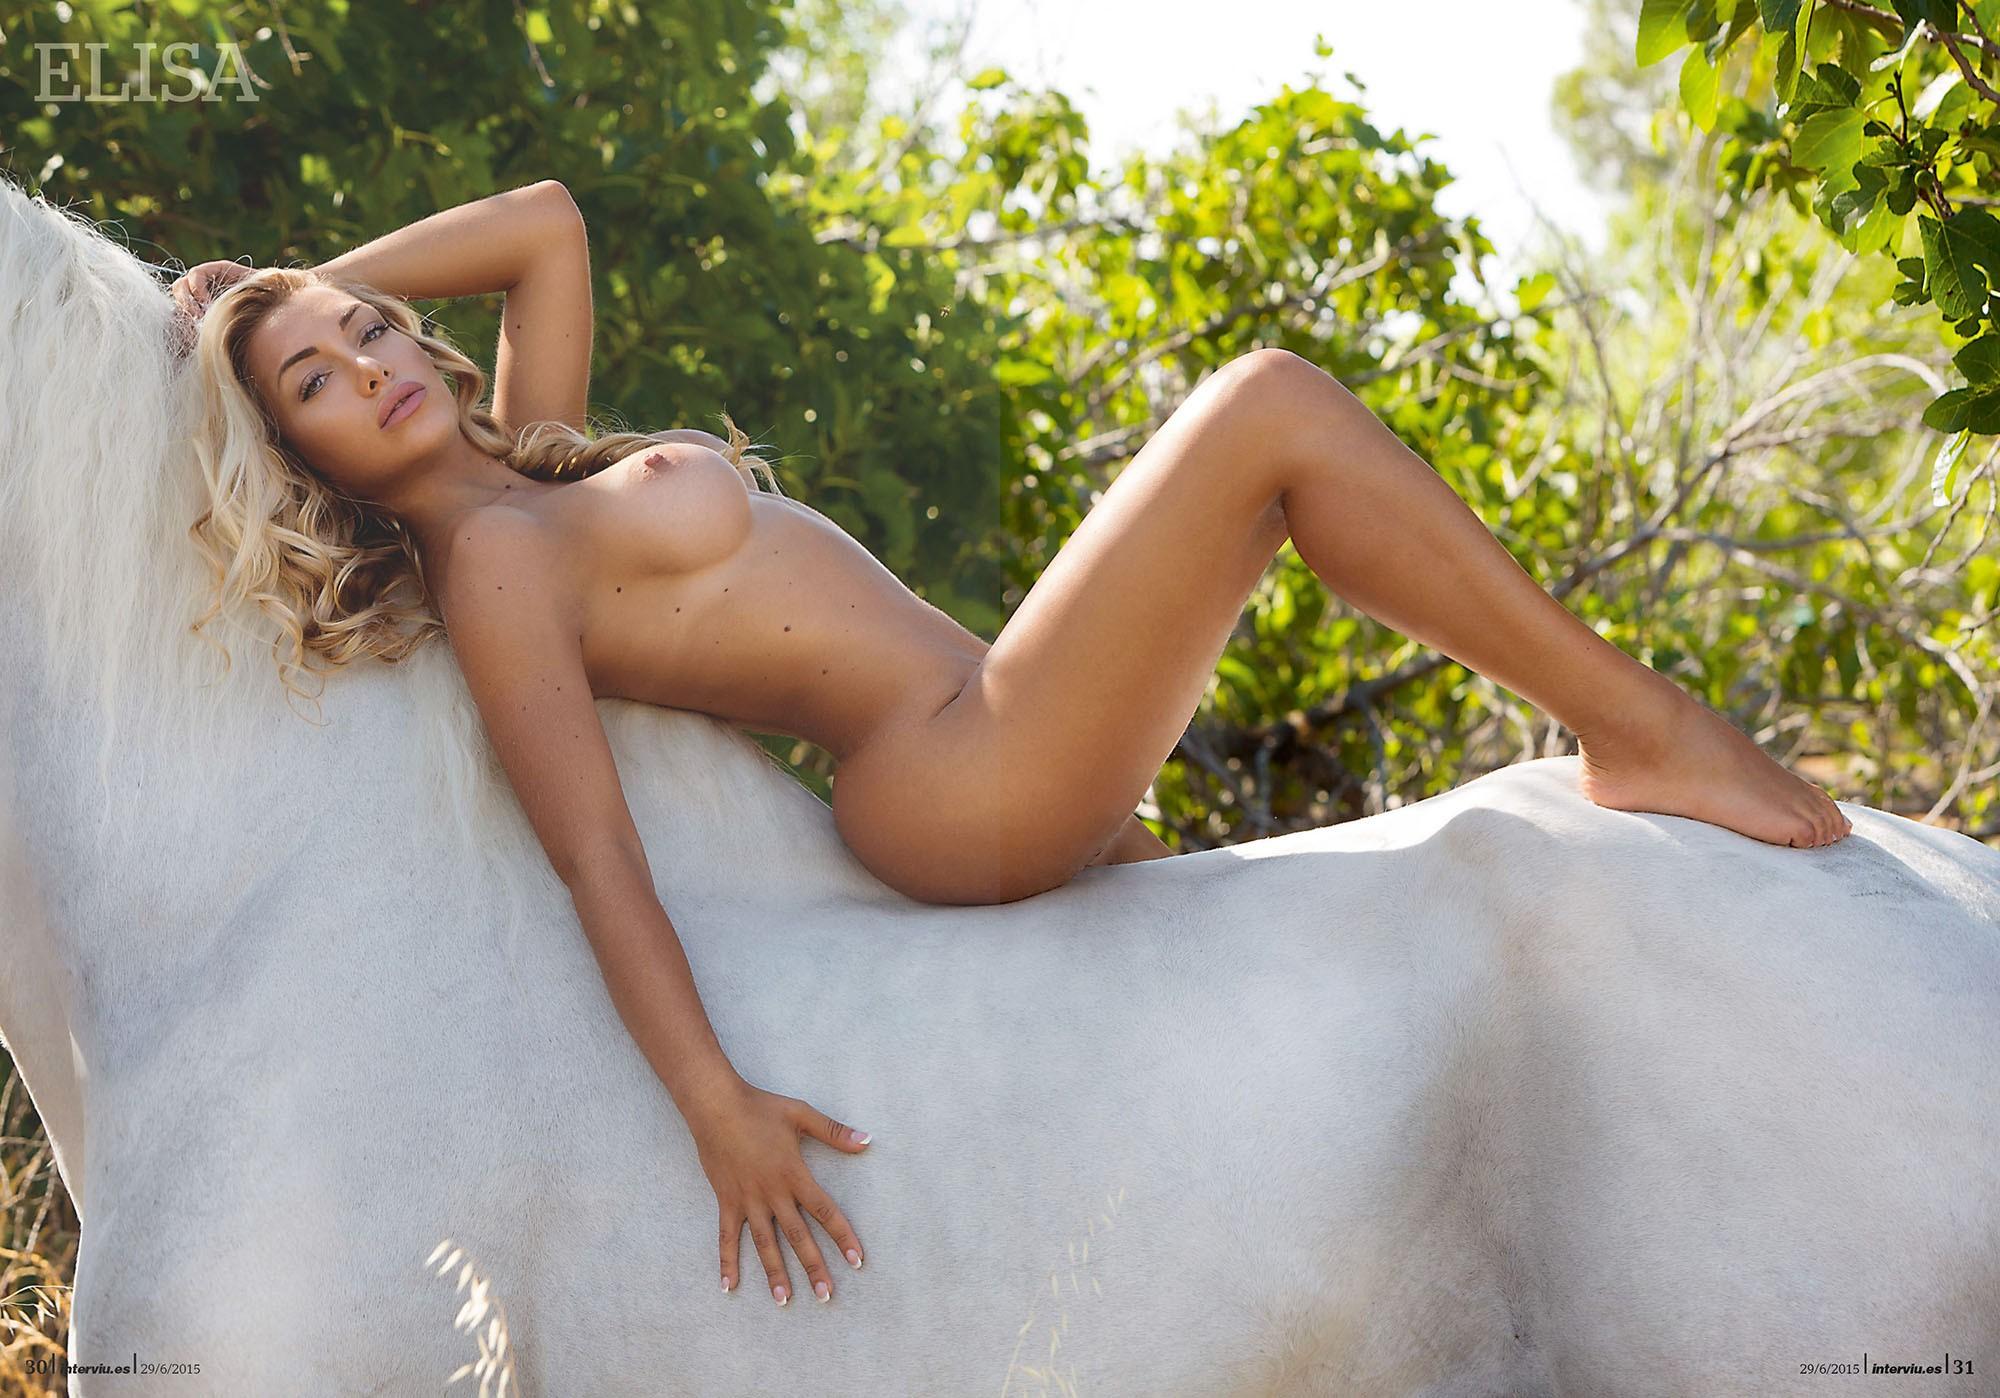 British mistress elise nude